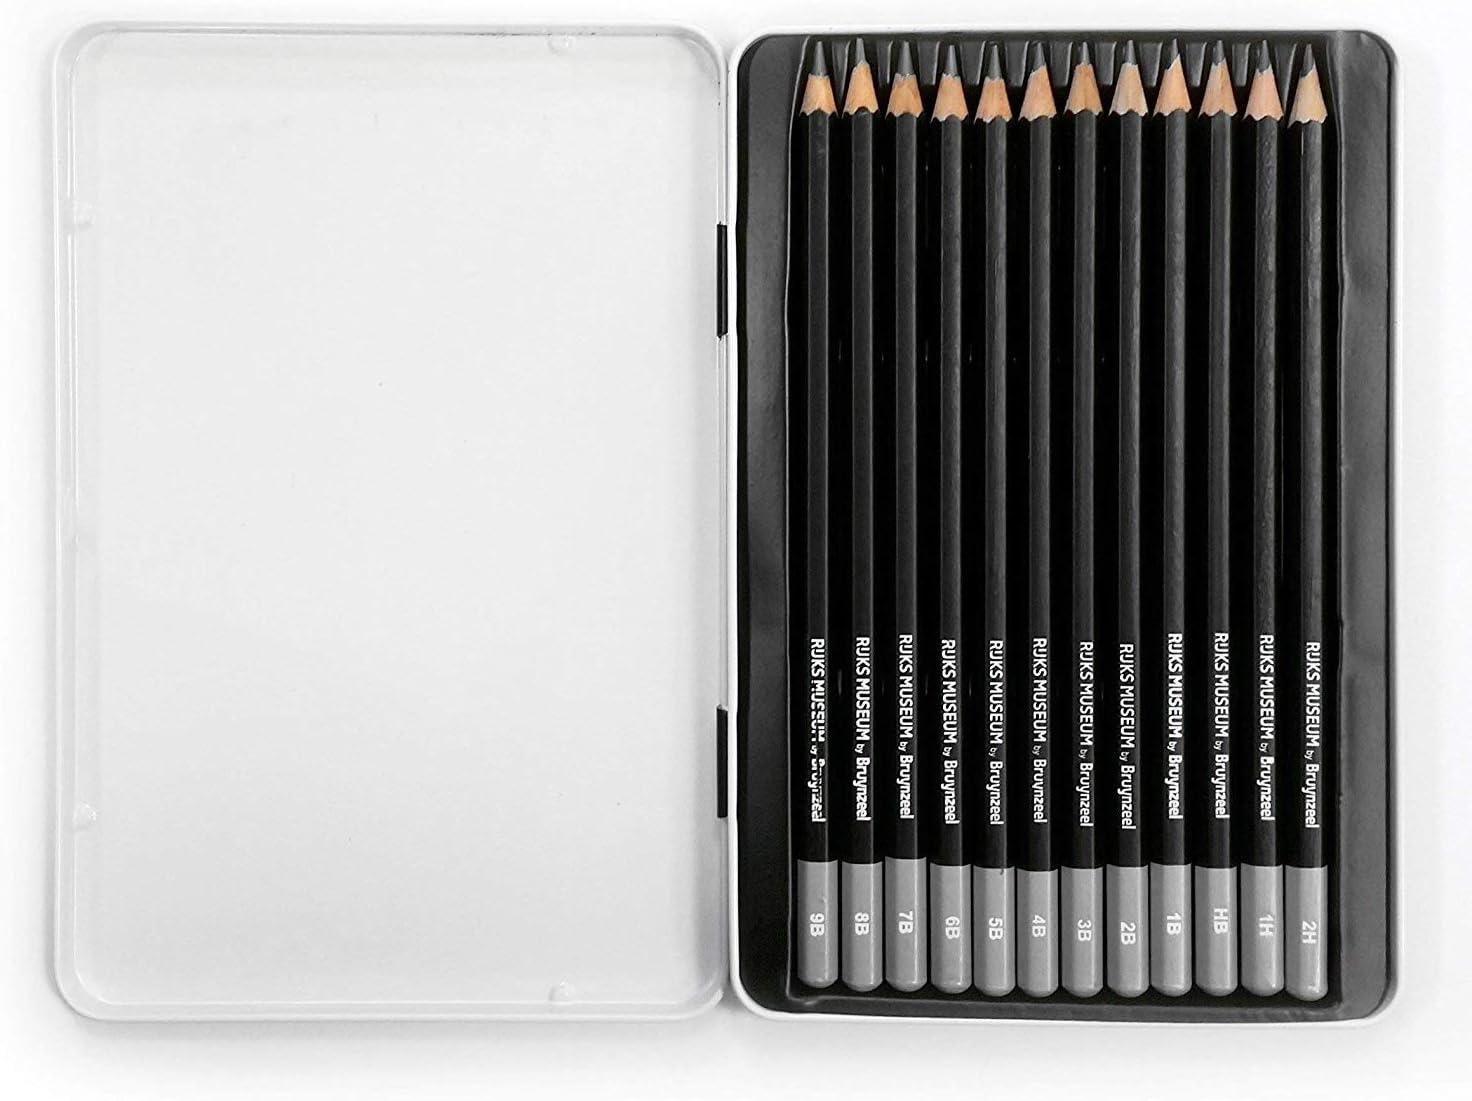 Bruynzeel 2 en 1 Taille-Crayon /& Effaceur